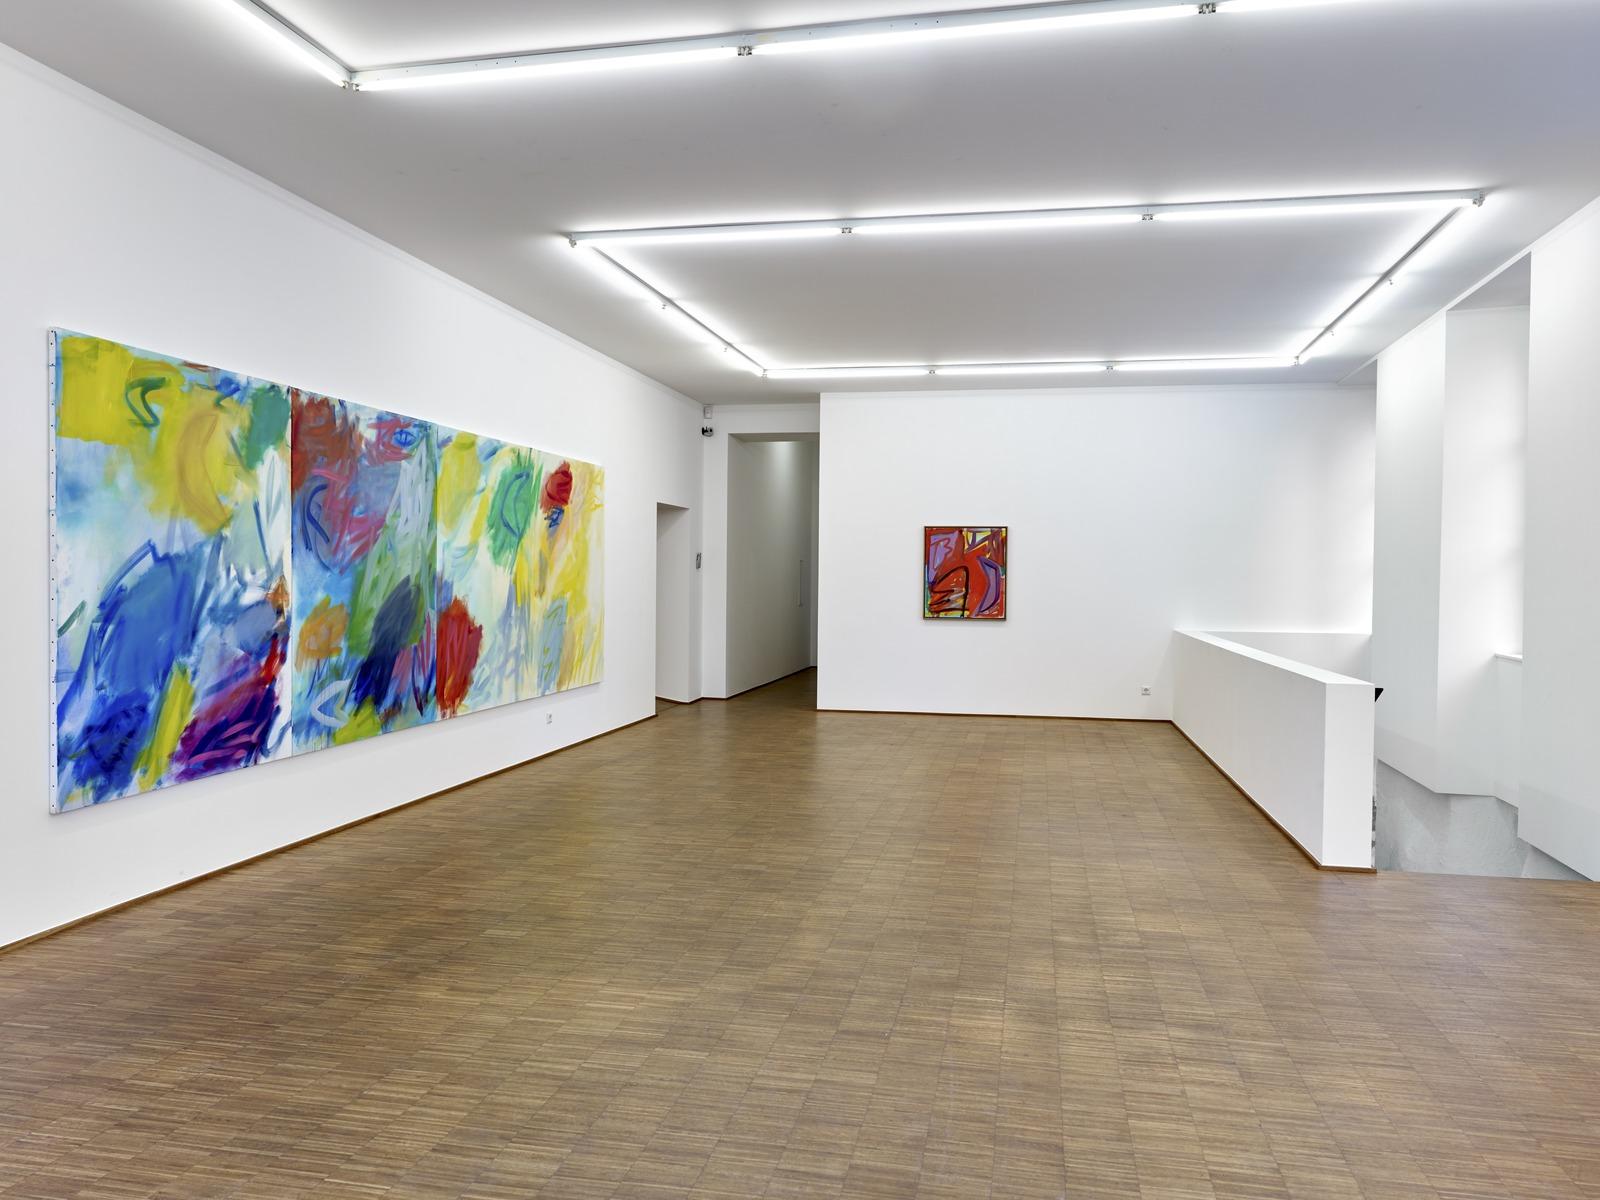 2_Sadie Laska 2015 luxembourg 1005